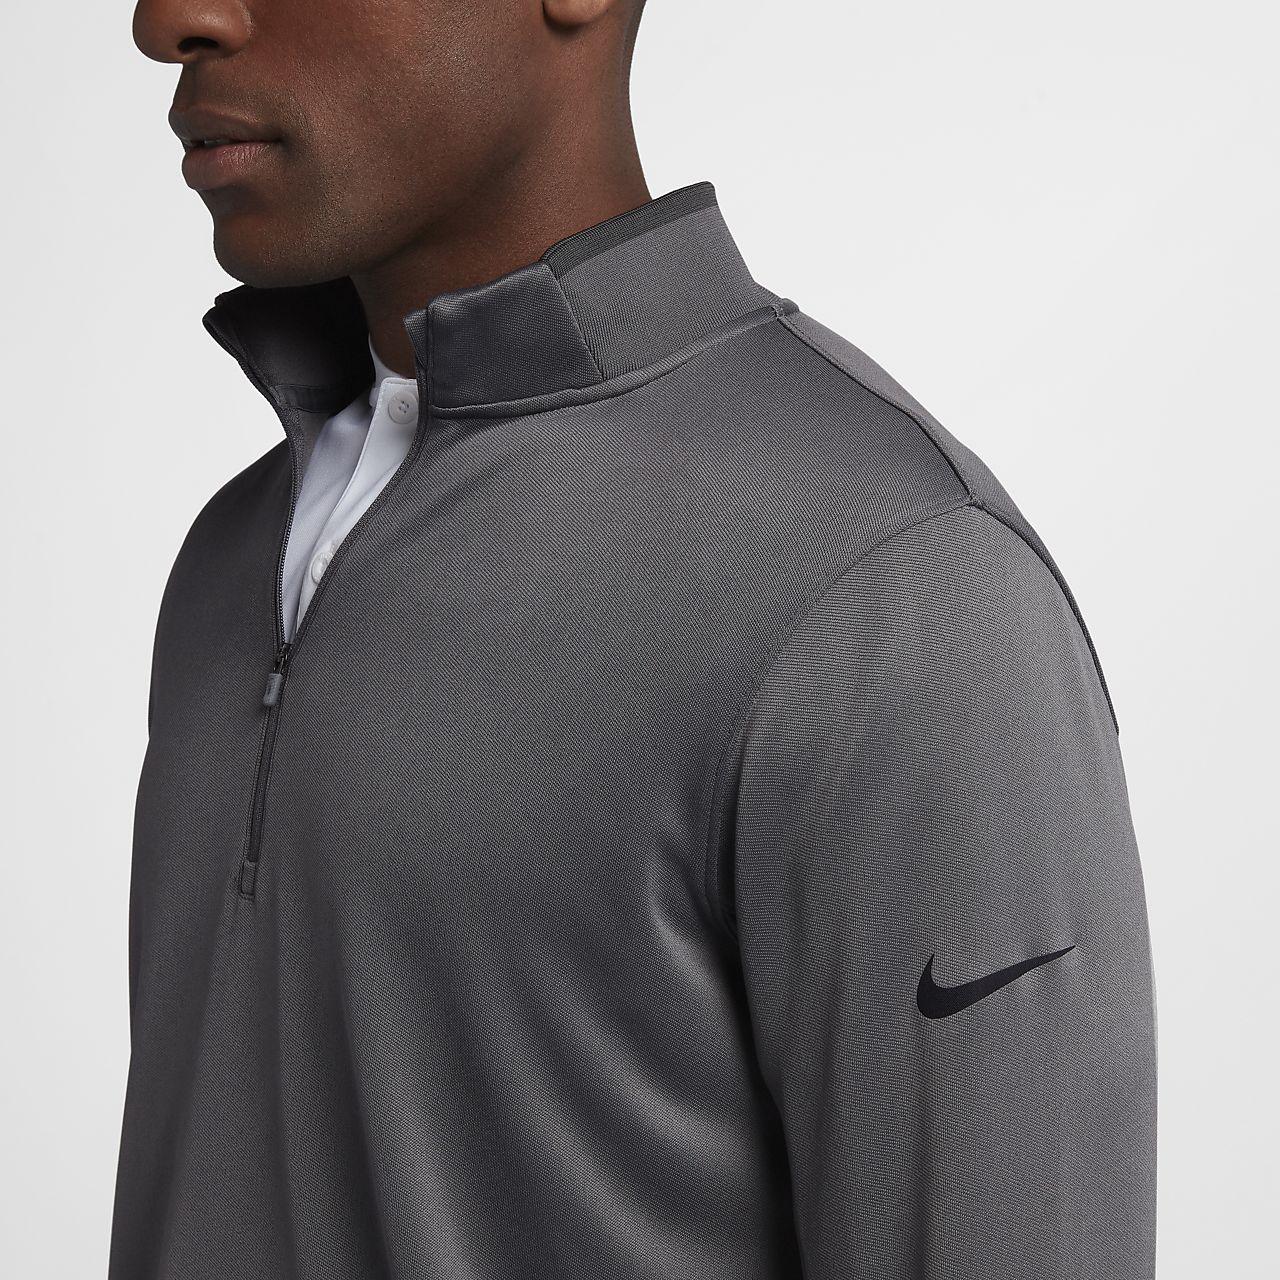 e7f1d524 Nike Dri-FIT Half-Zip Men's Long-Sleeve Golf Top. Nike.com CH